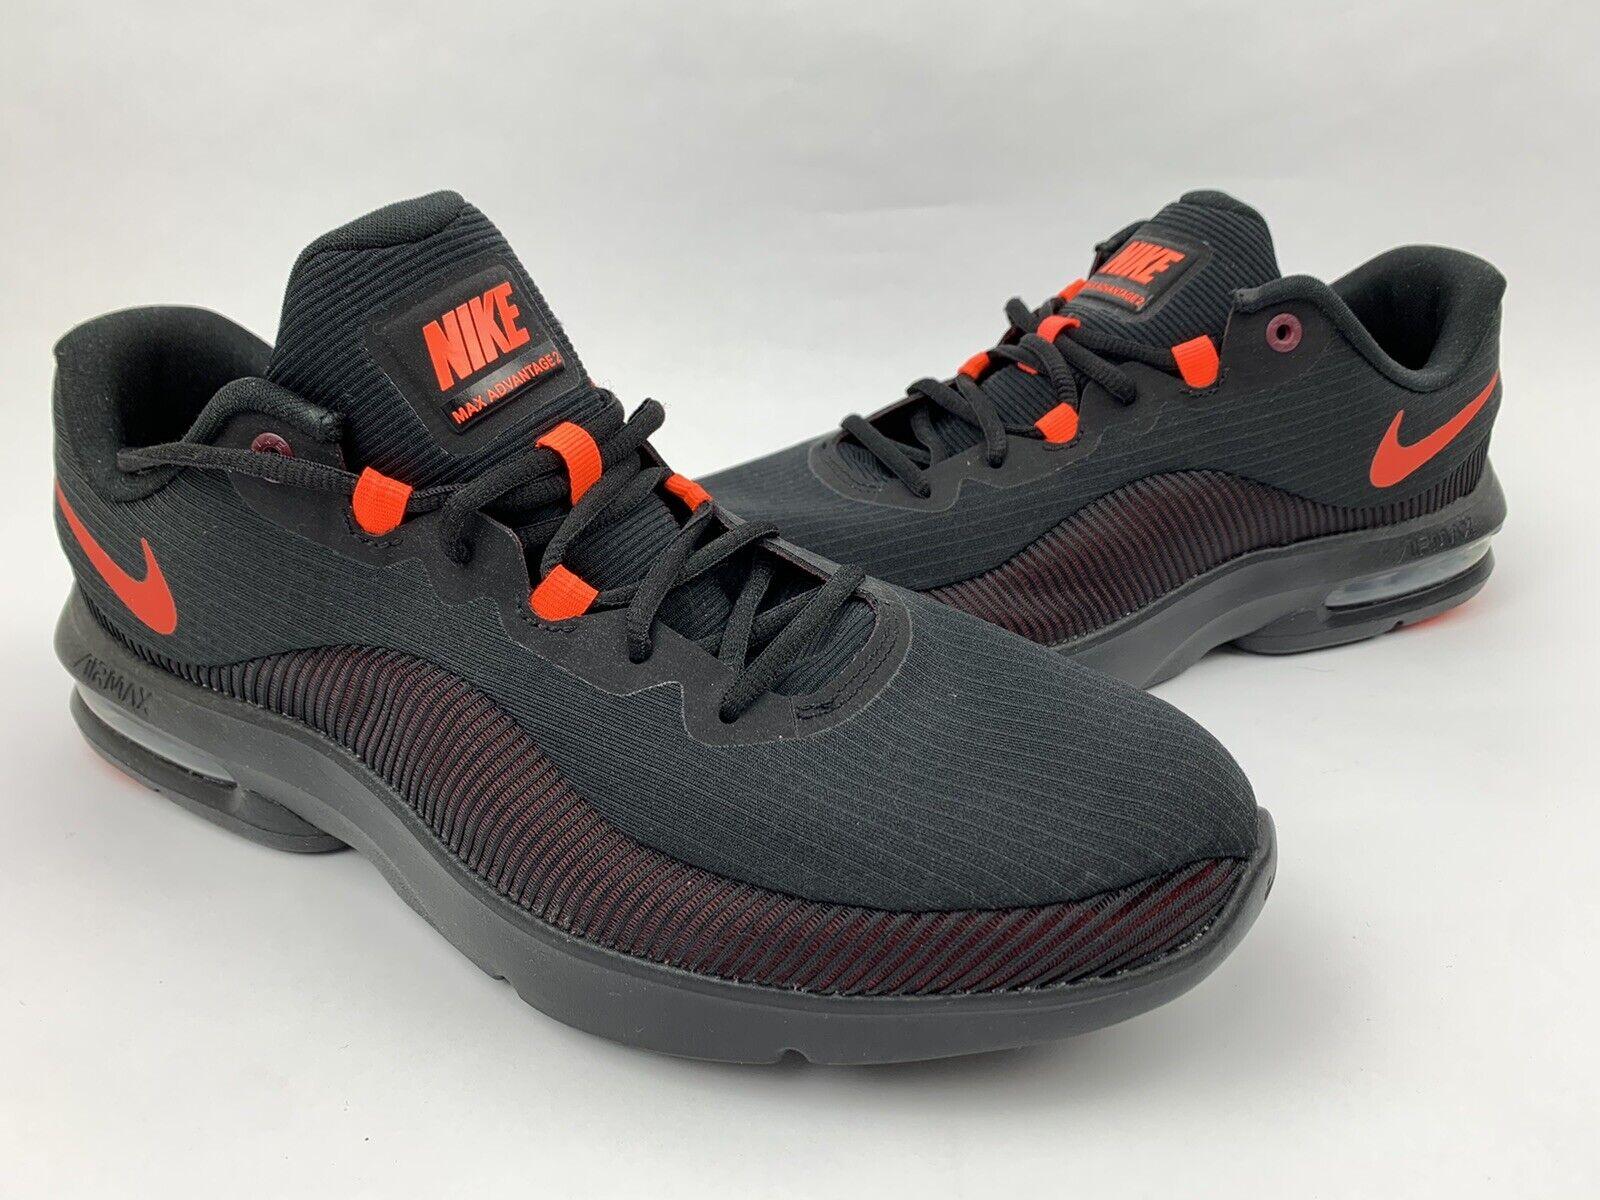 Men's Nike Air Max Advantage 2 Running